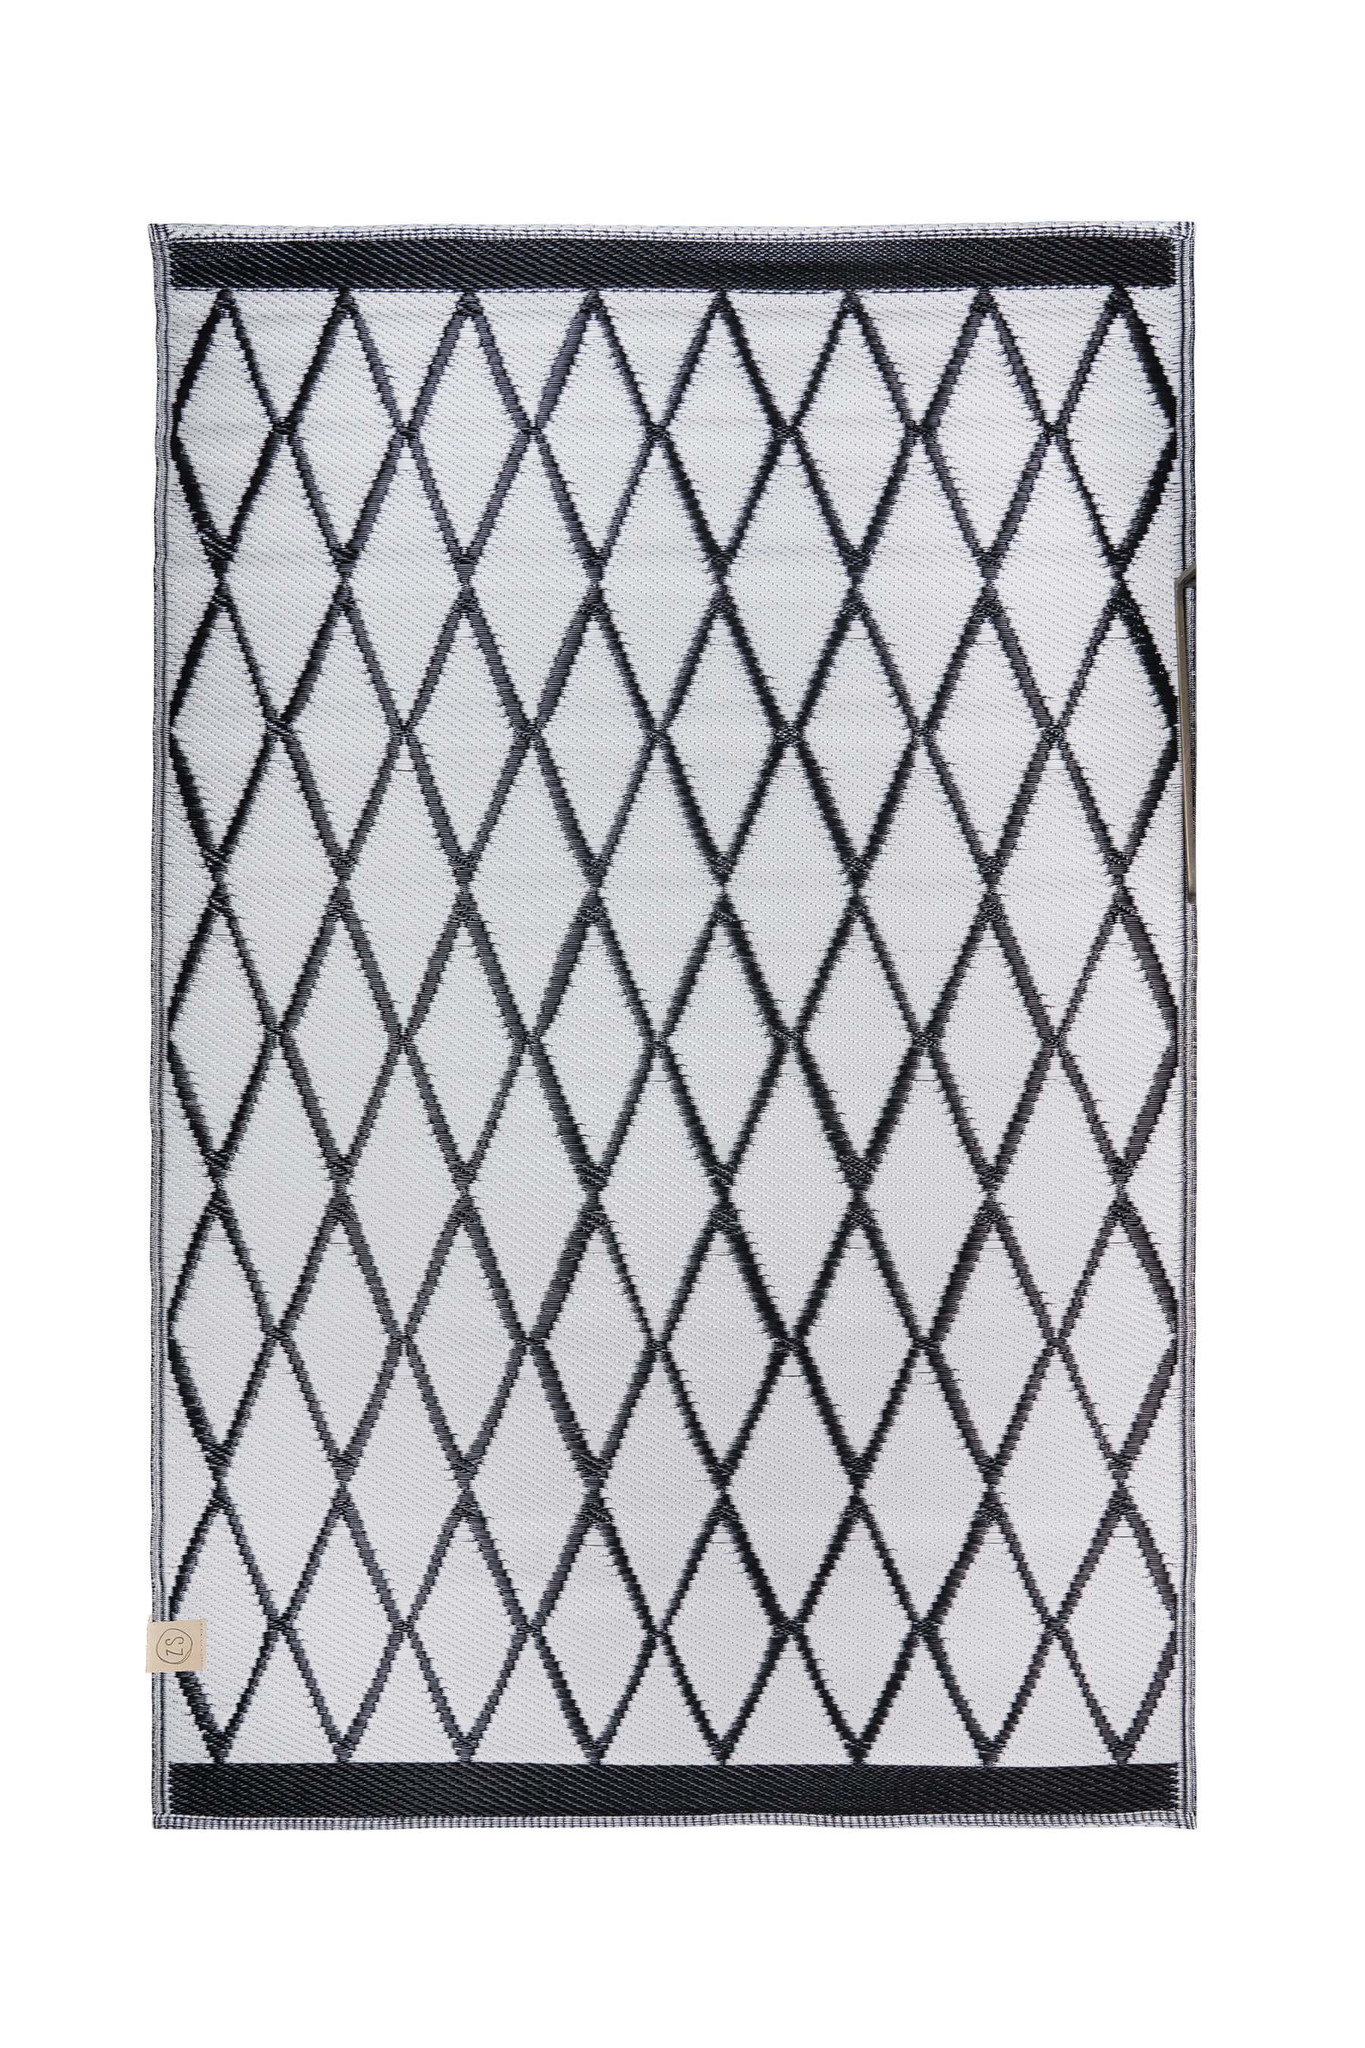 Zusss Buitenkleed 180x120 zwart/zand